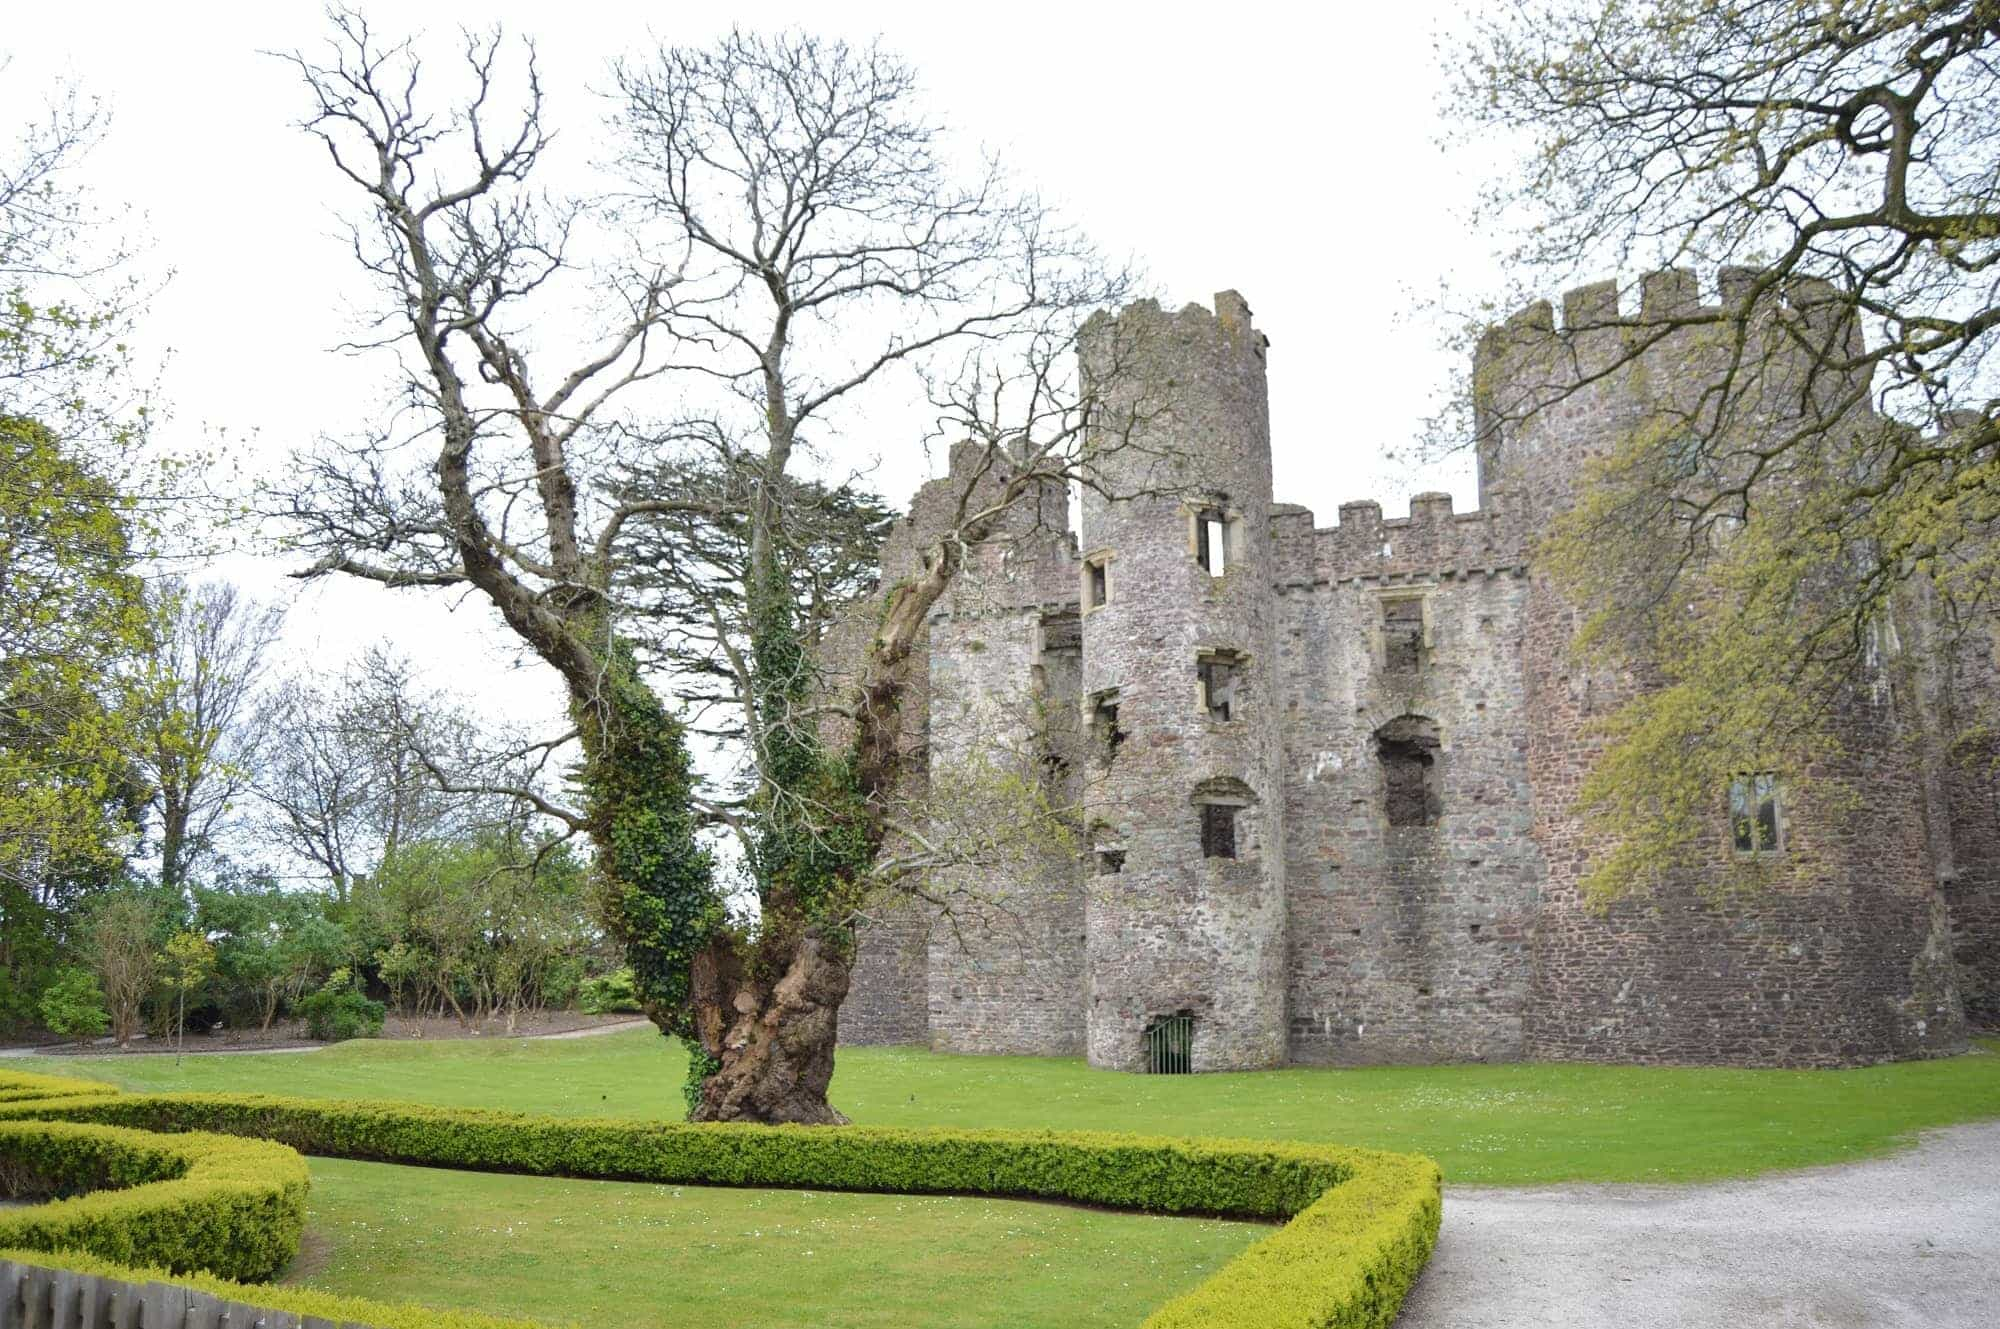 Facing Laugharne Castle